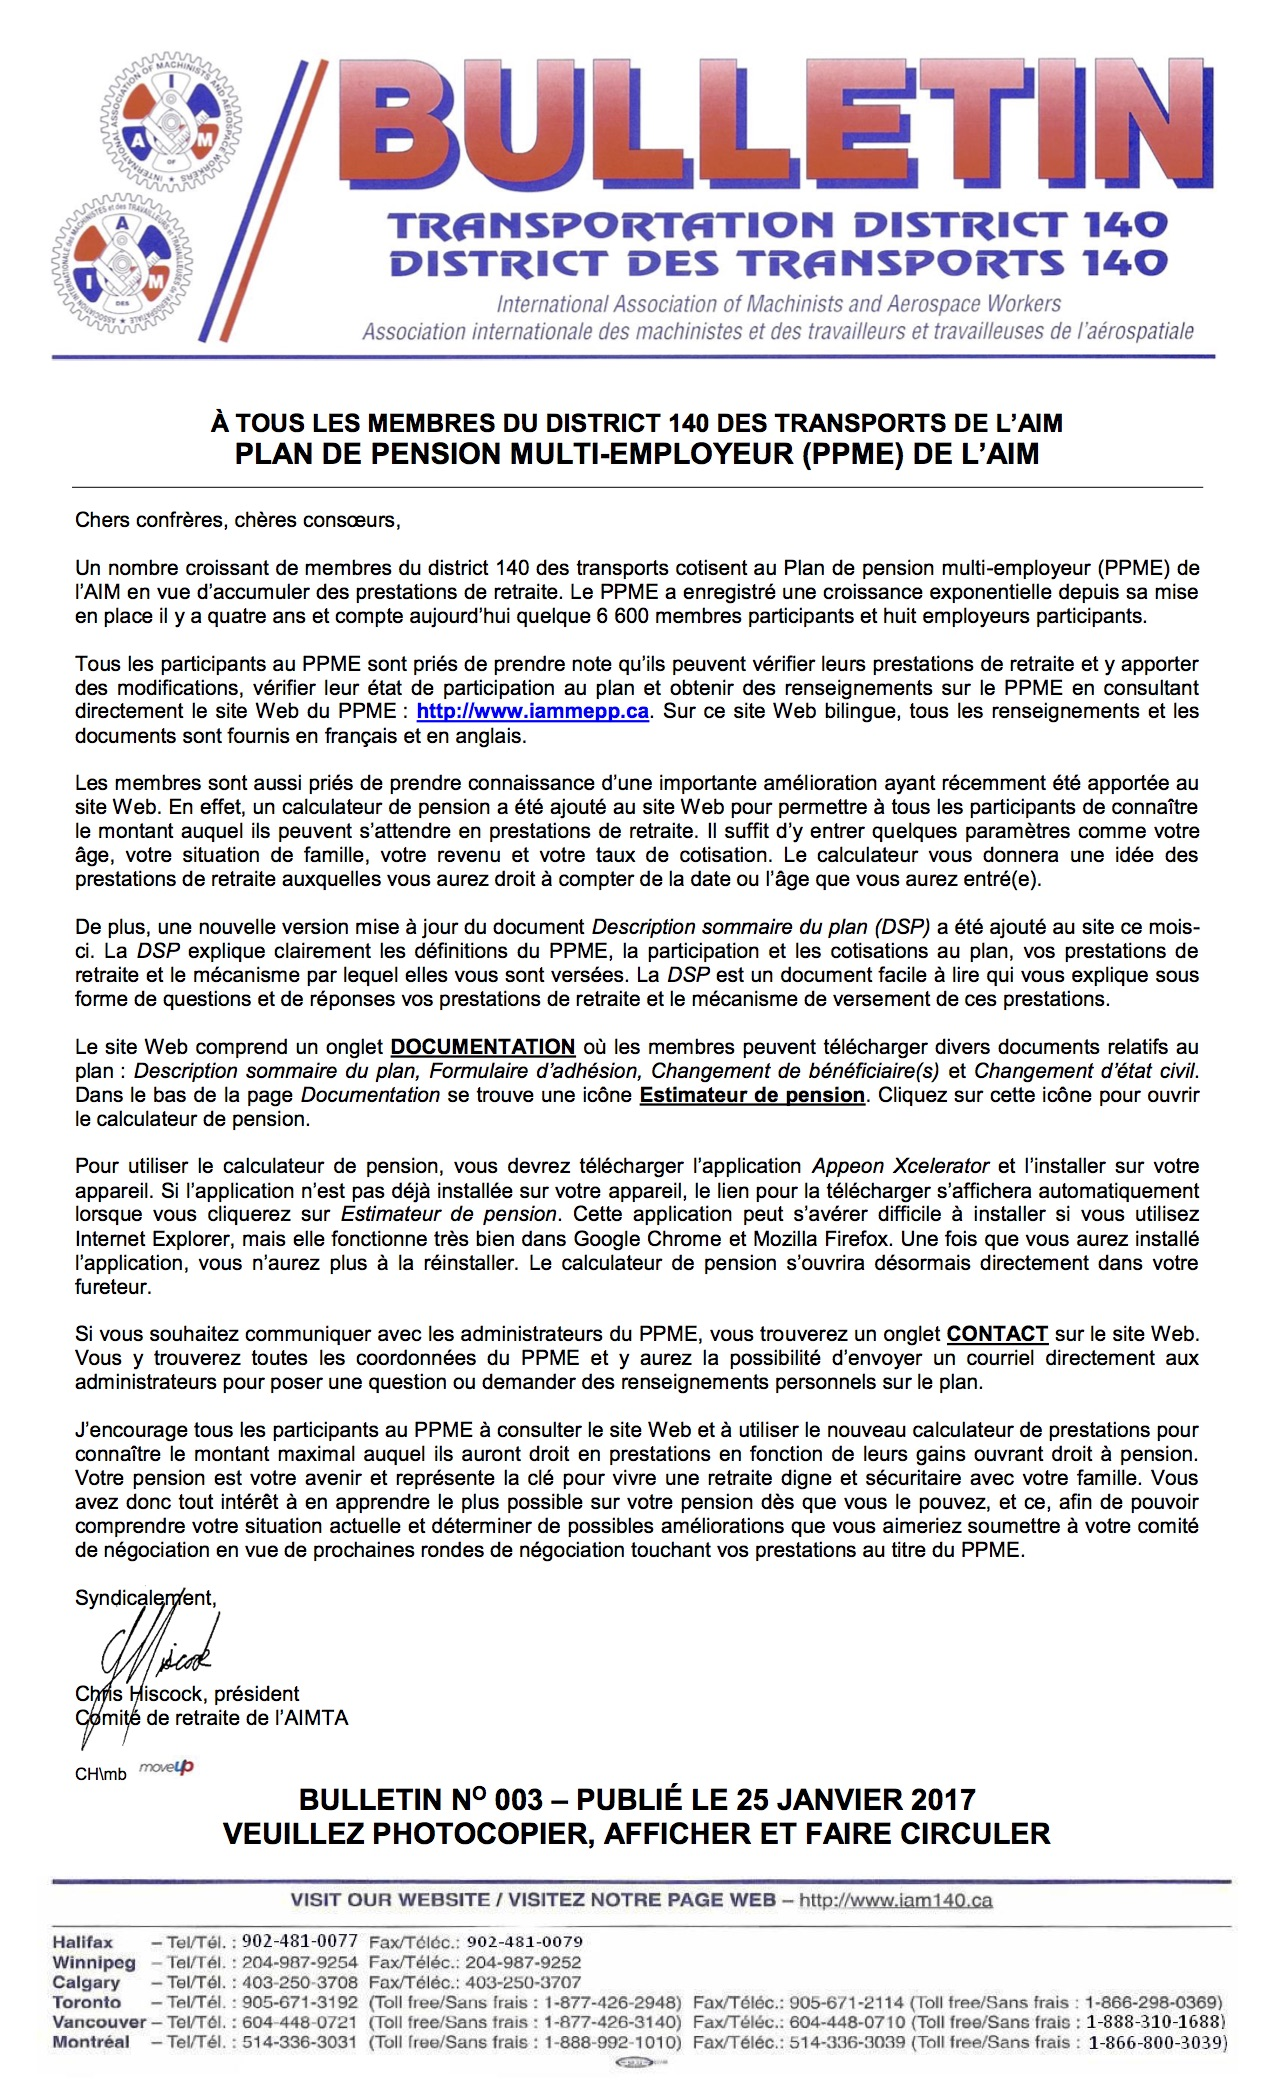 BULLETIN 003 - DISTRICT 140 MULTI-EMPLOYER PENSION PLAN (Français)